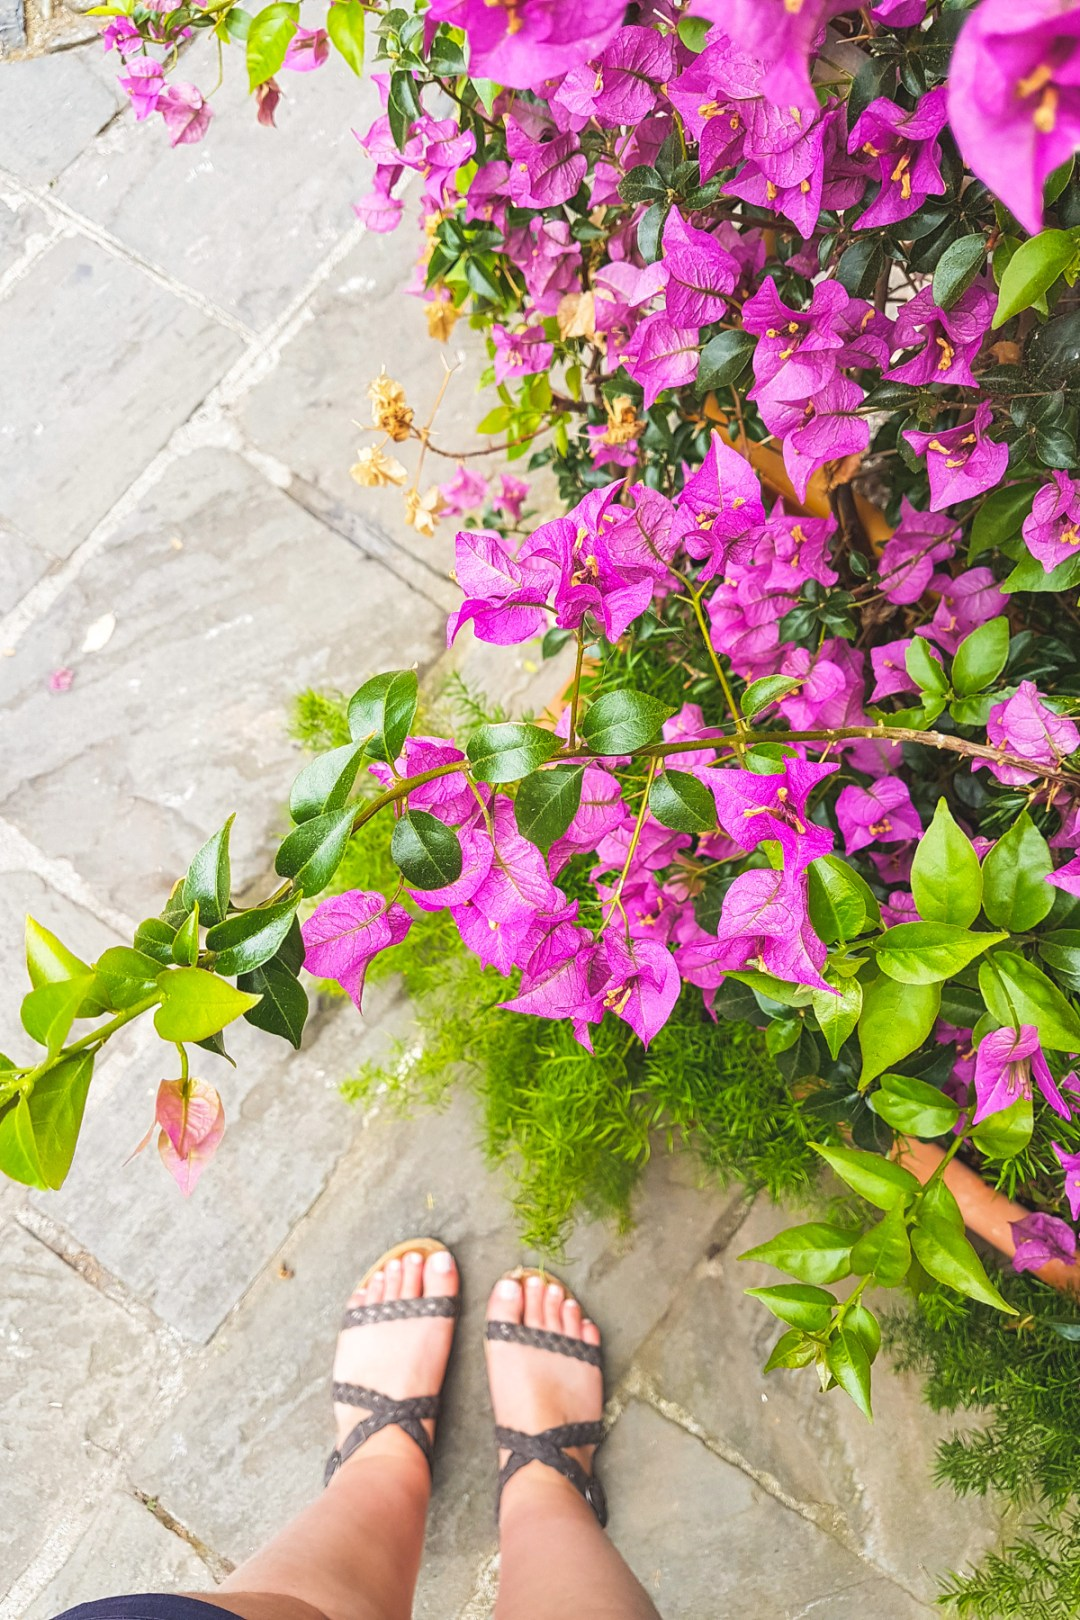 Bougainvillea Flowers in Portofino, Liguria, Italy